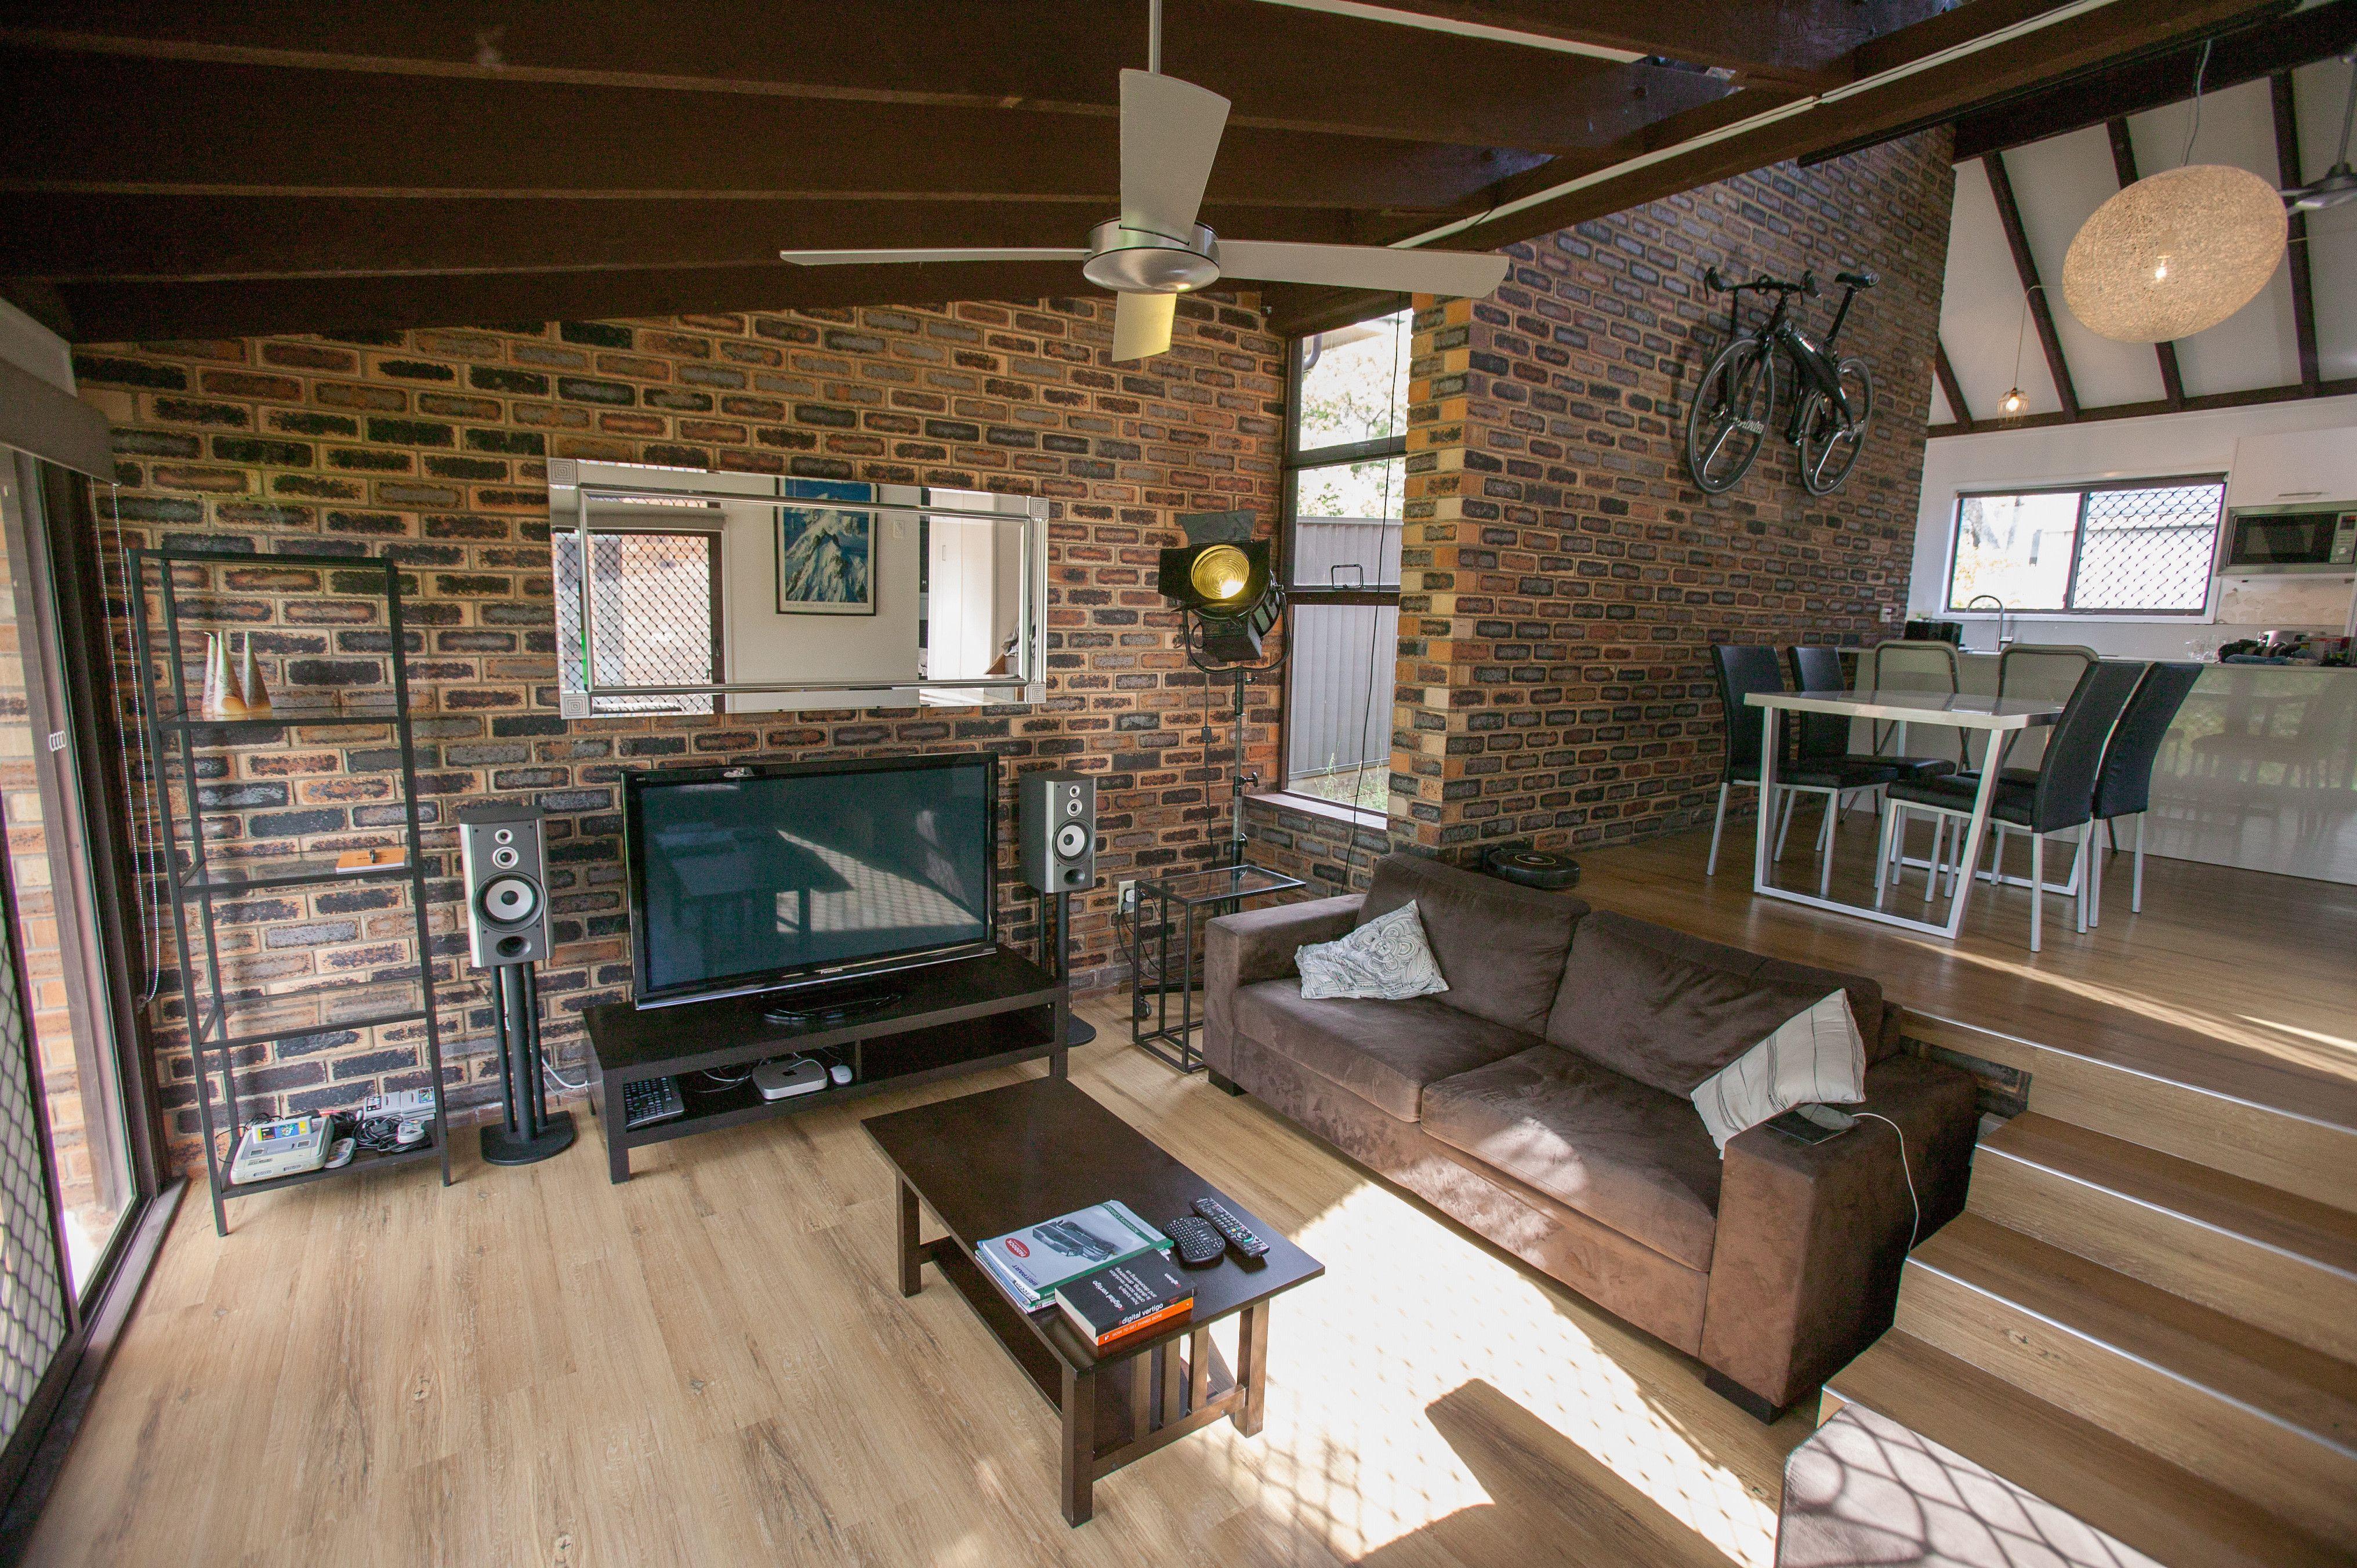 Wood & brick lounge/diner [OC] [4064x2704] http//ift.tt